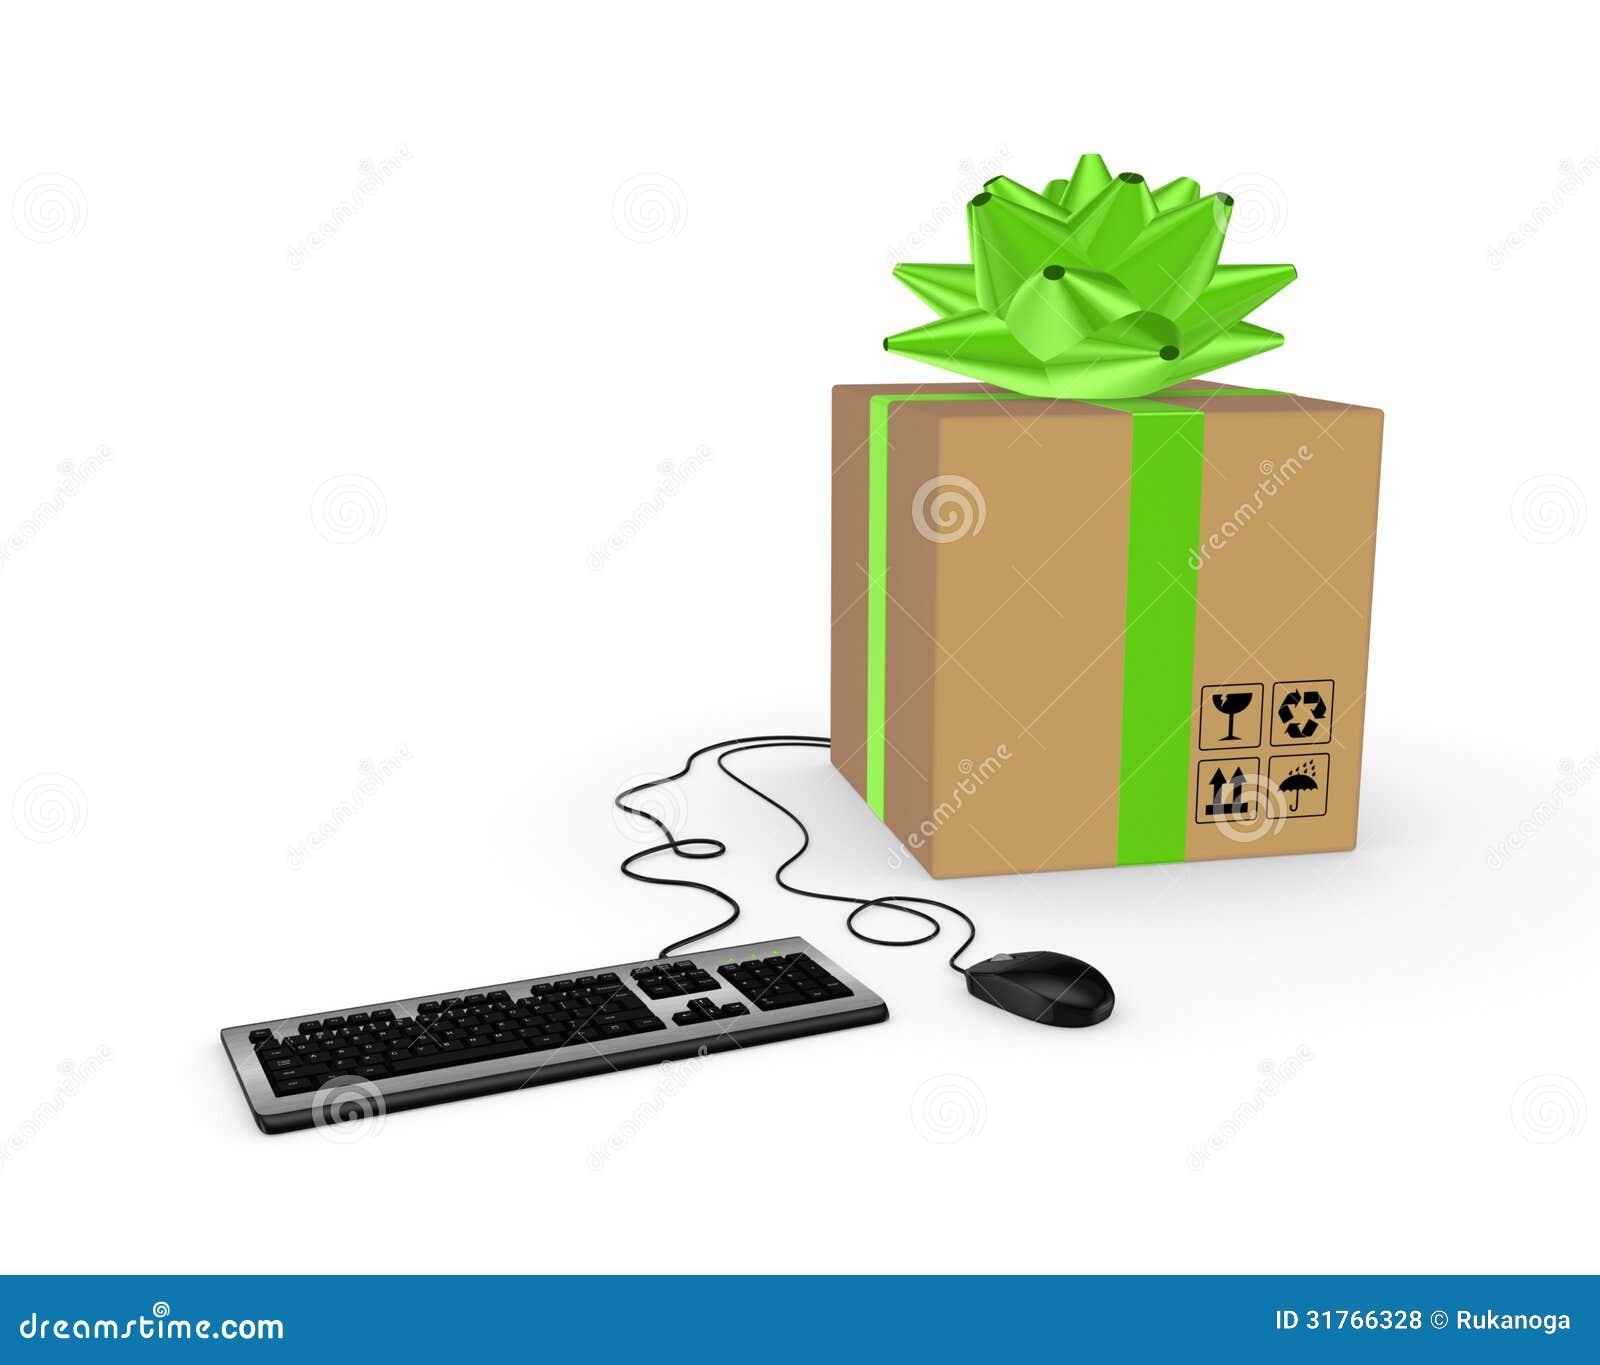 Computer mouse keyboard and carton box stock illustration royalty free stock photo buycottarizona